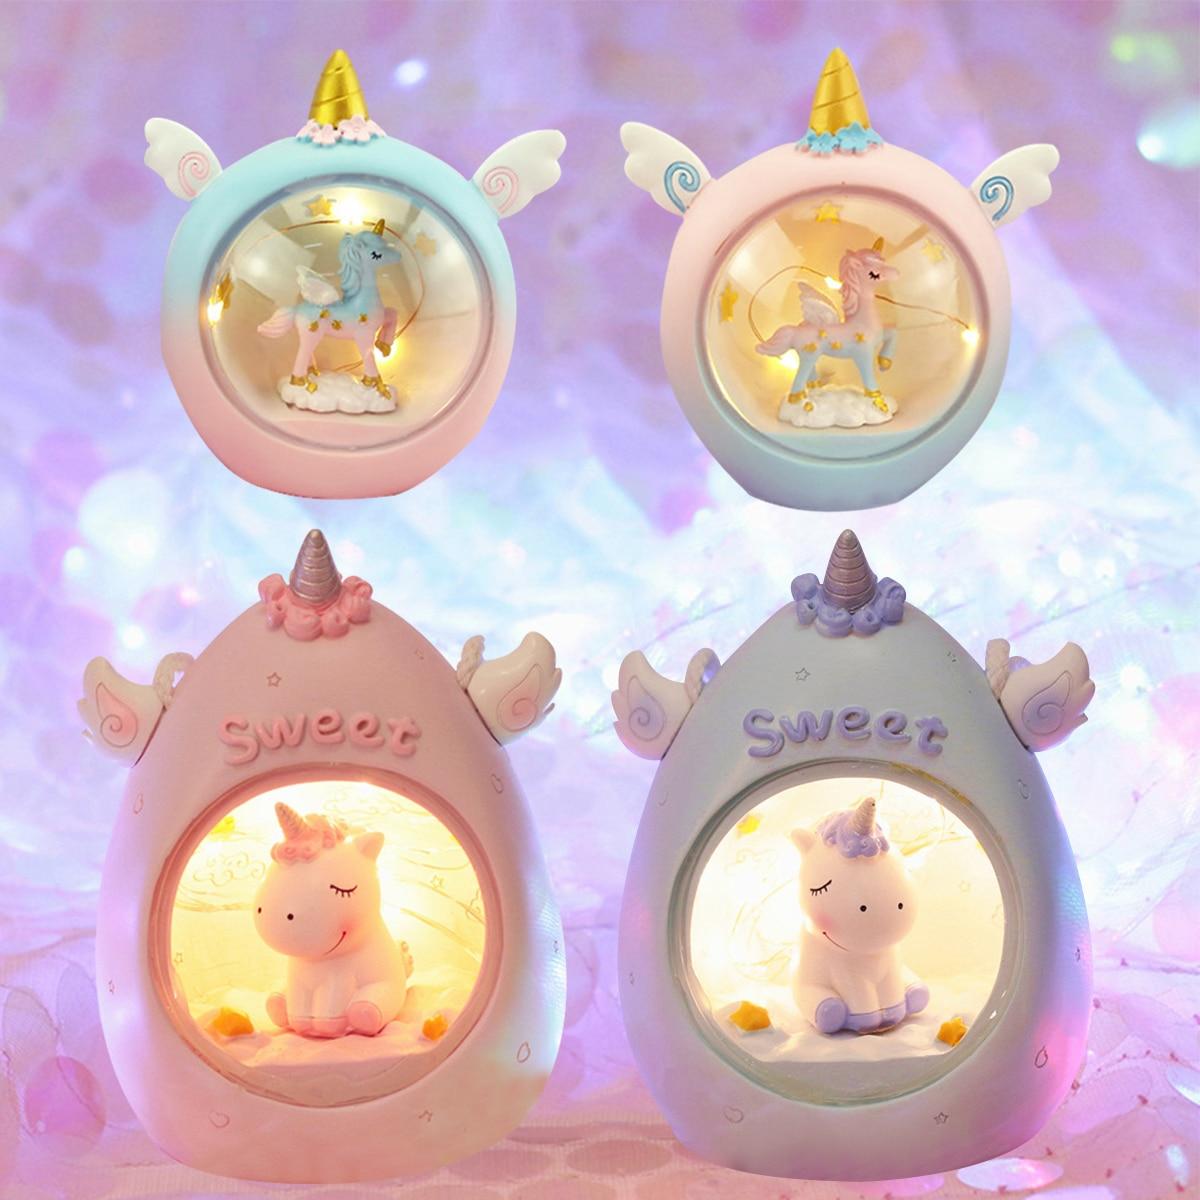 LED Cartoon Unicorn Night Light Baby Nursery Lamps Table Decorative Light Children Kids Toys Birthday Xmas Gift Drop Shipping